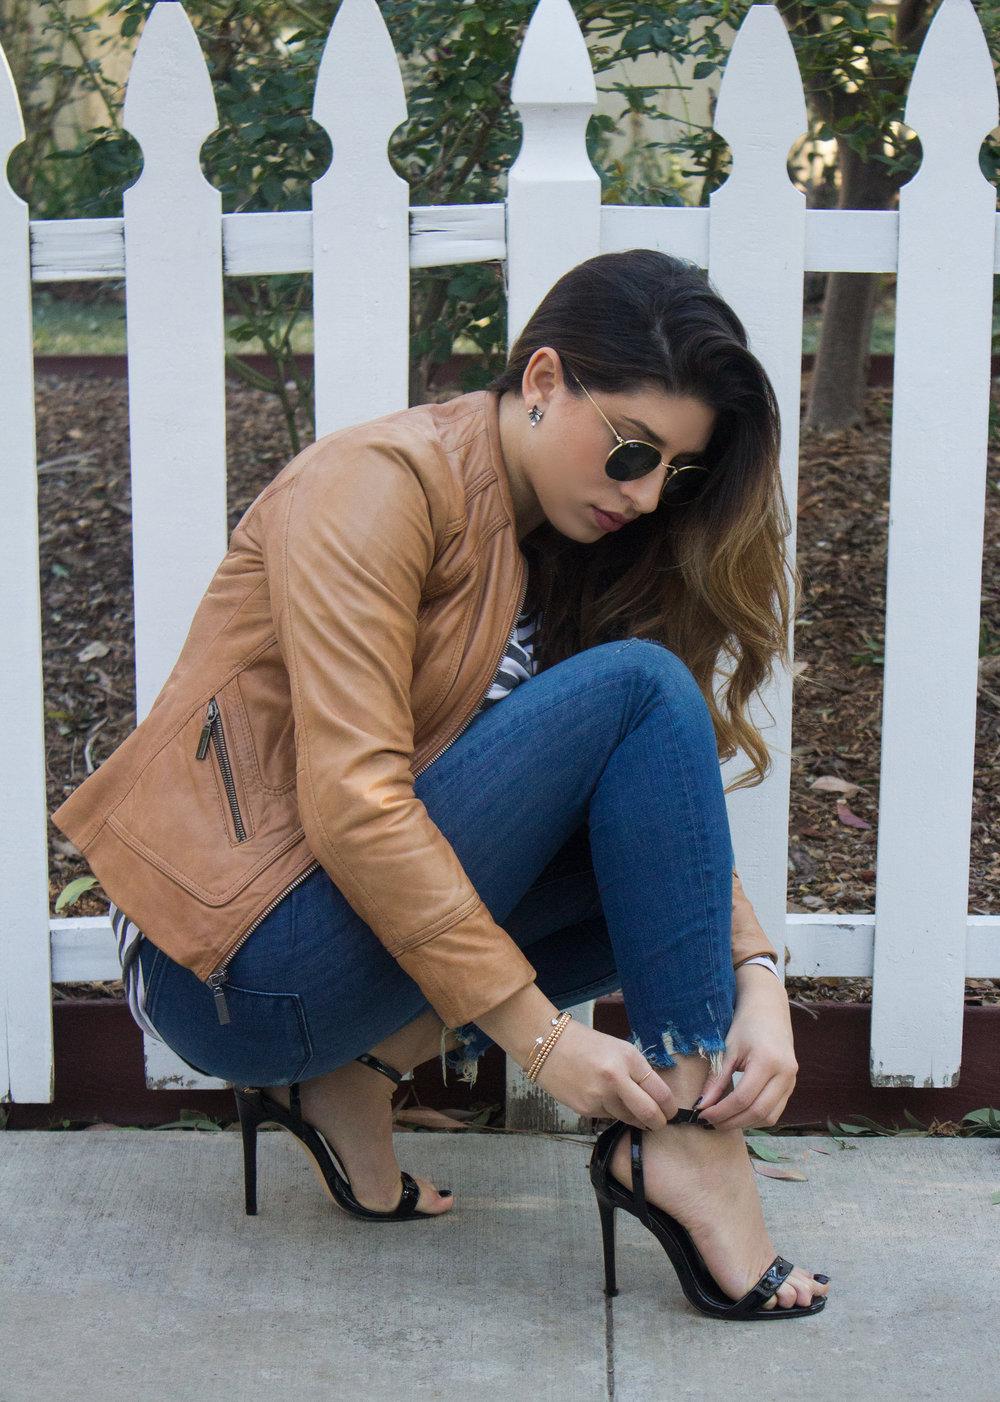 mel-ronnie-camel-leather-jacket-stripes-black-celine-envelope-clutch-patent-sandals-frayed-hem-jeans-round-sunglasses-6.jpg